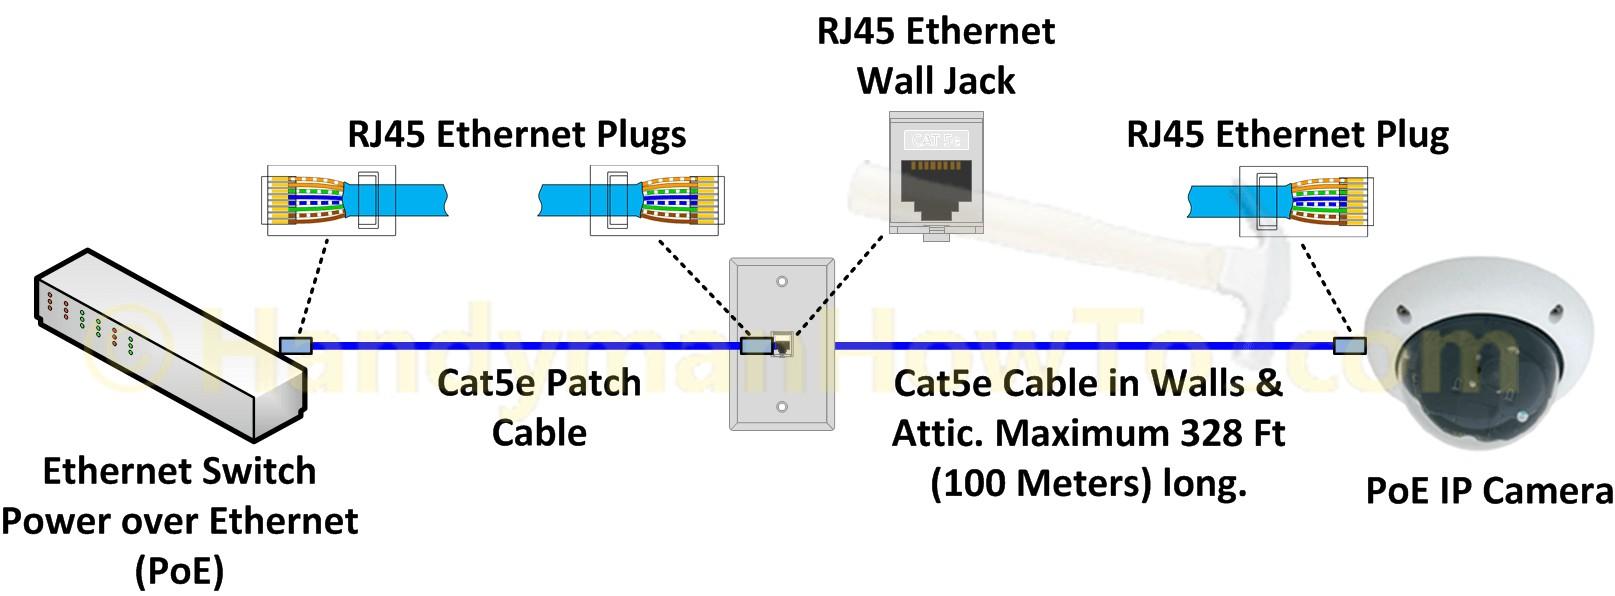 Network Cable Wiring Diagram Inside mastertopforum